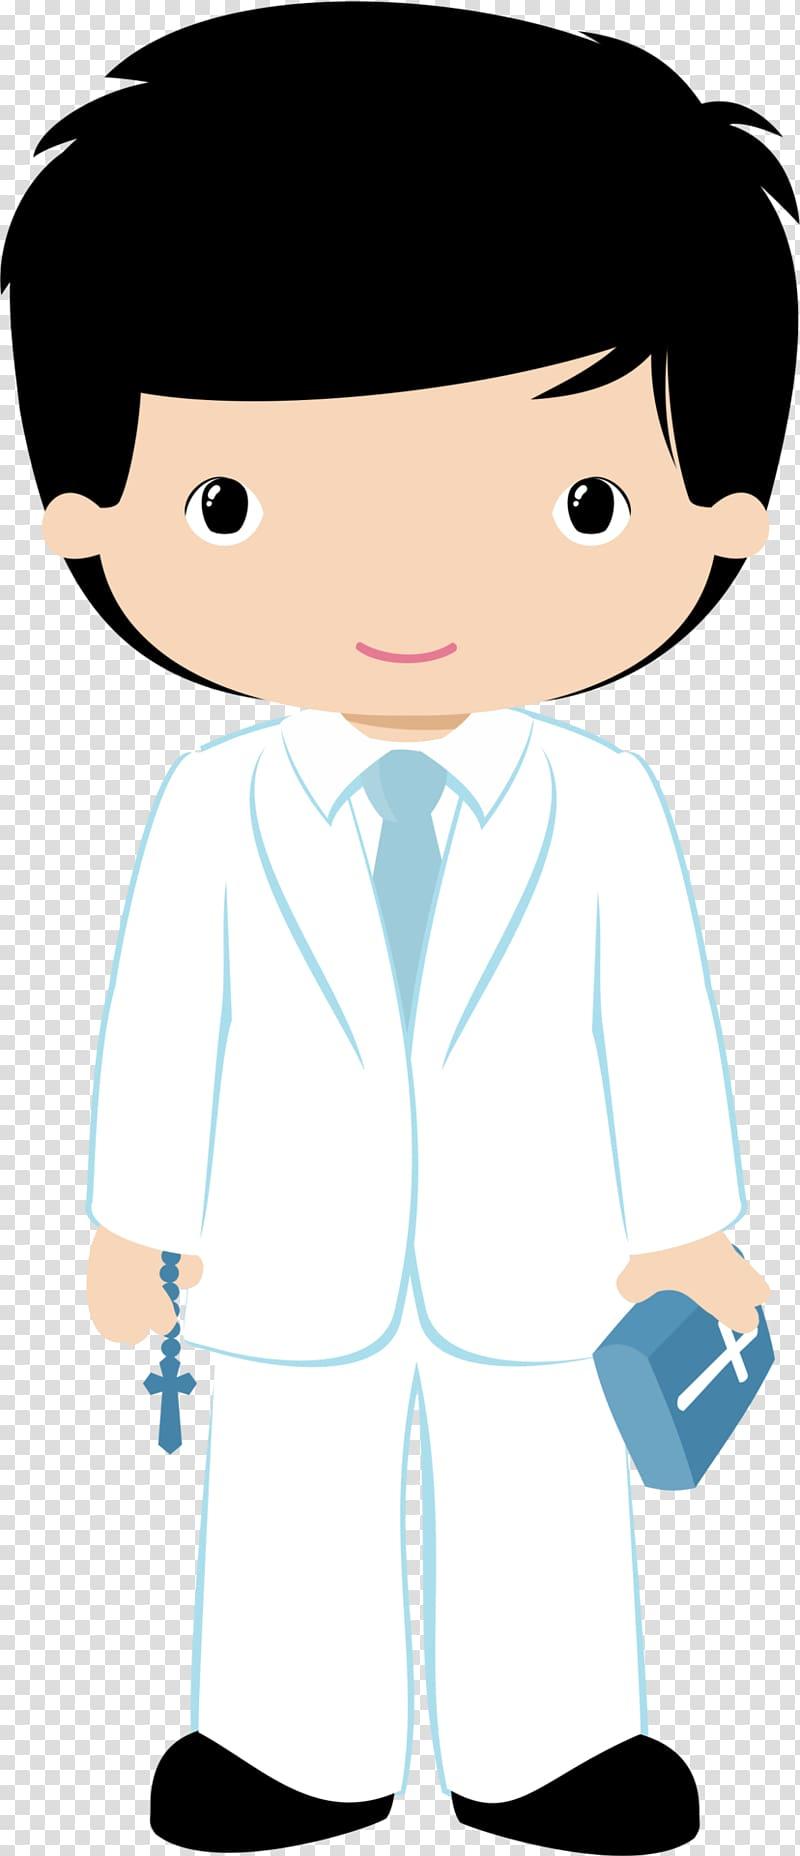 Boy wearing white suit holding bible art illustration, First.